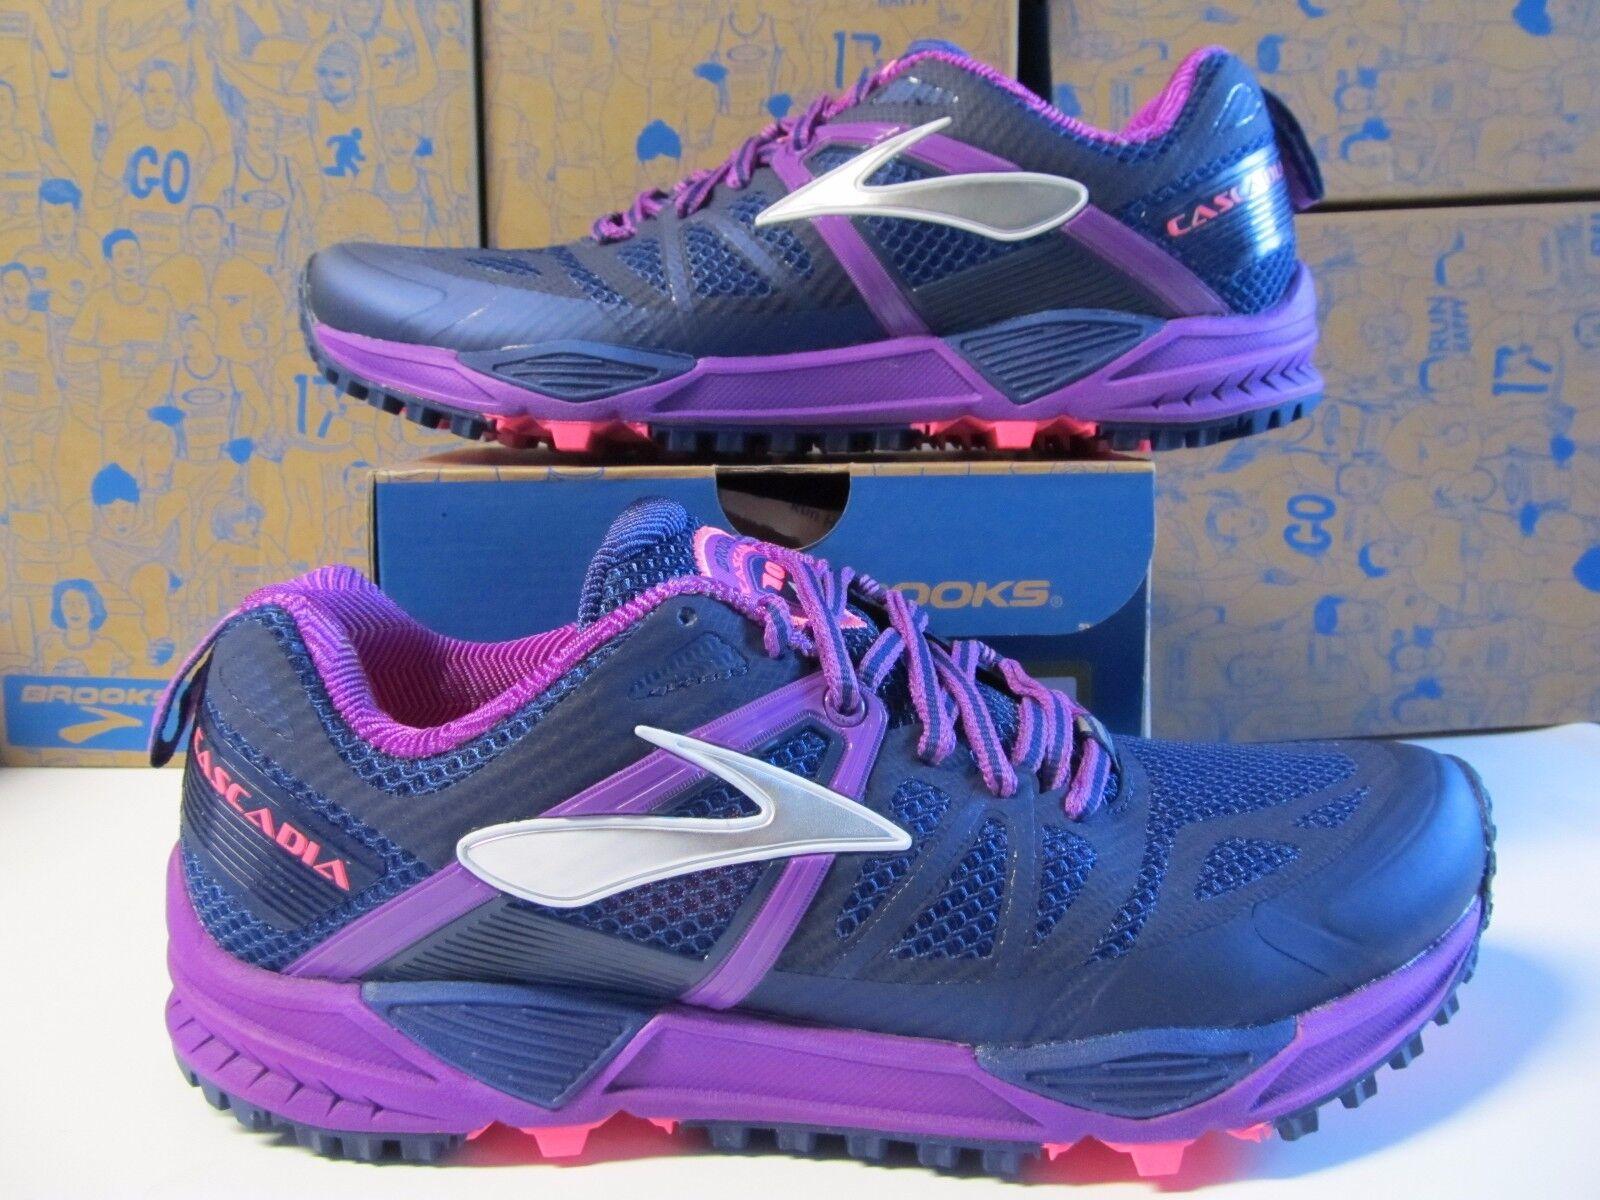 Brooks Cascadia 10  120 para senderismo y atletismo Púrpura Púrpura Púrpura de medianoche Cactus Flower Azul  autorización oficial